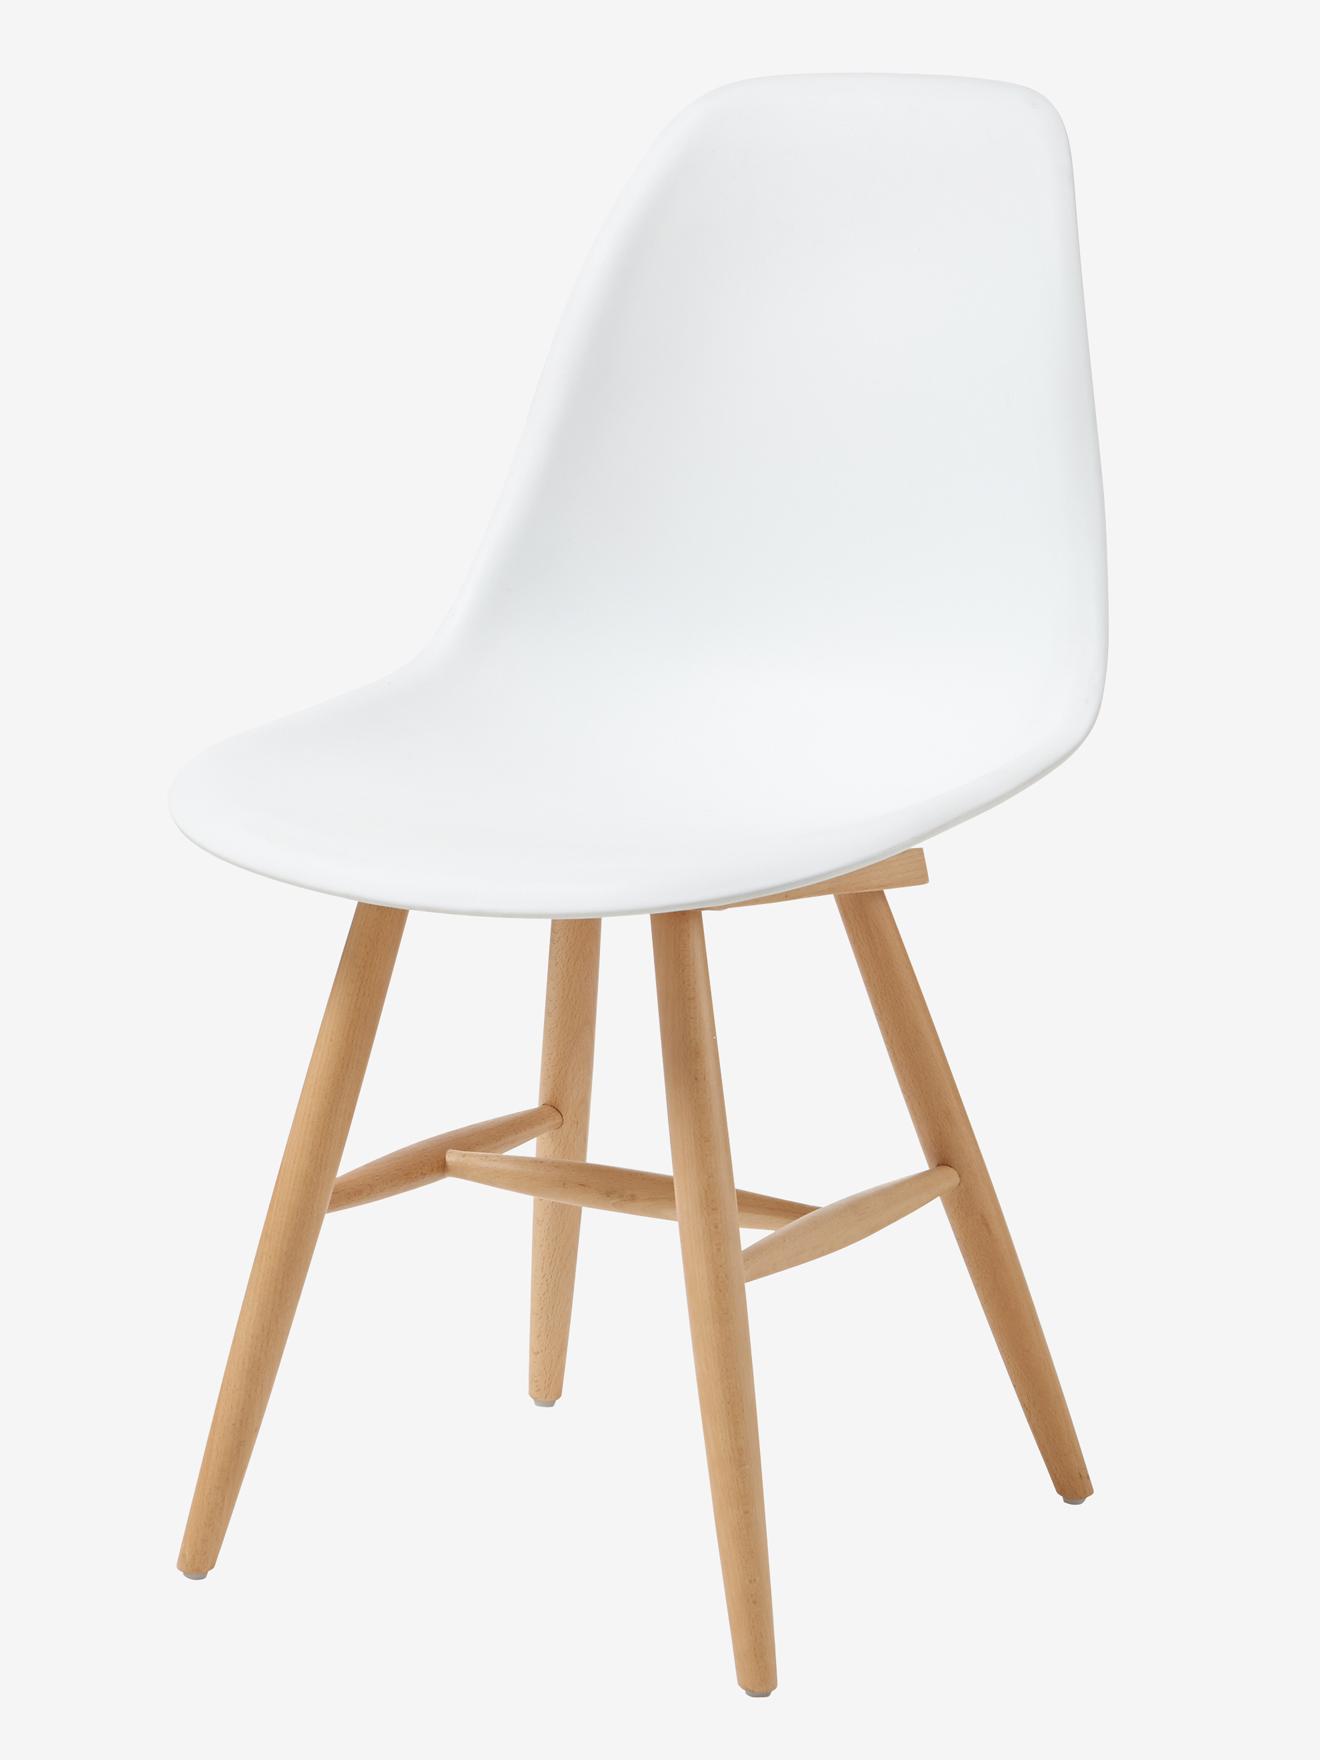 Vertbaudet chaise scandinave